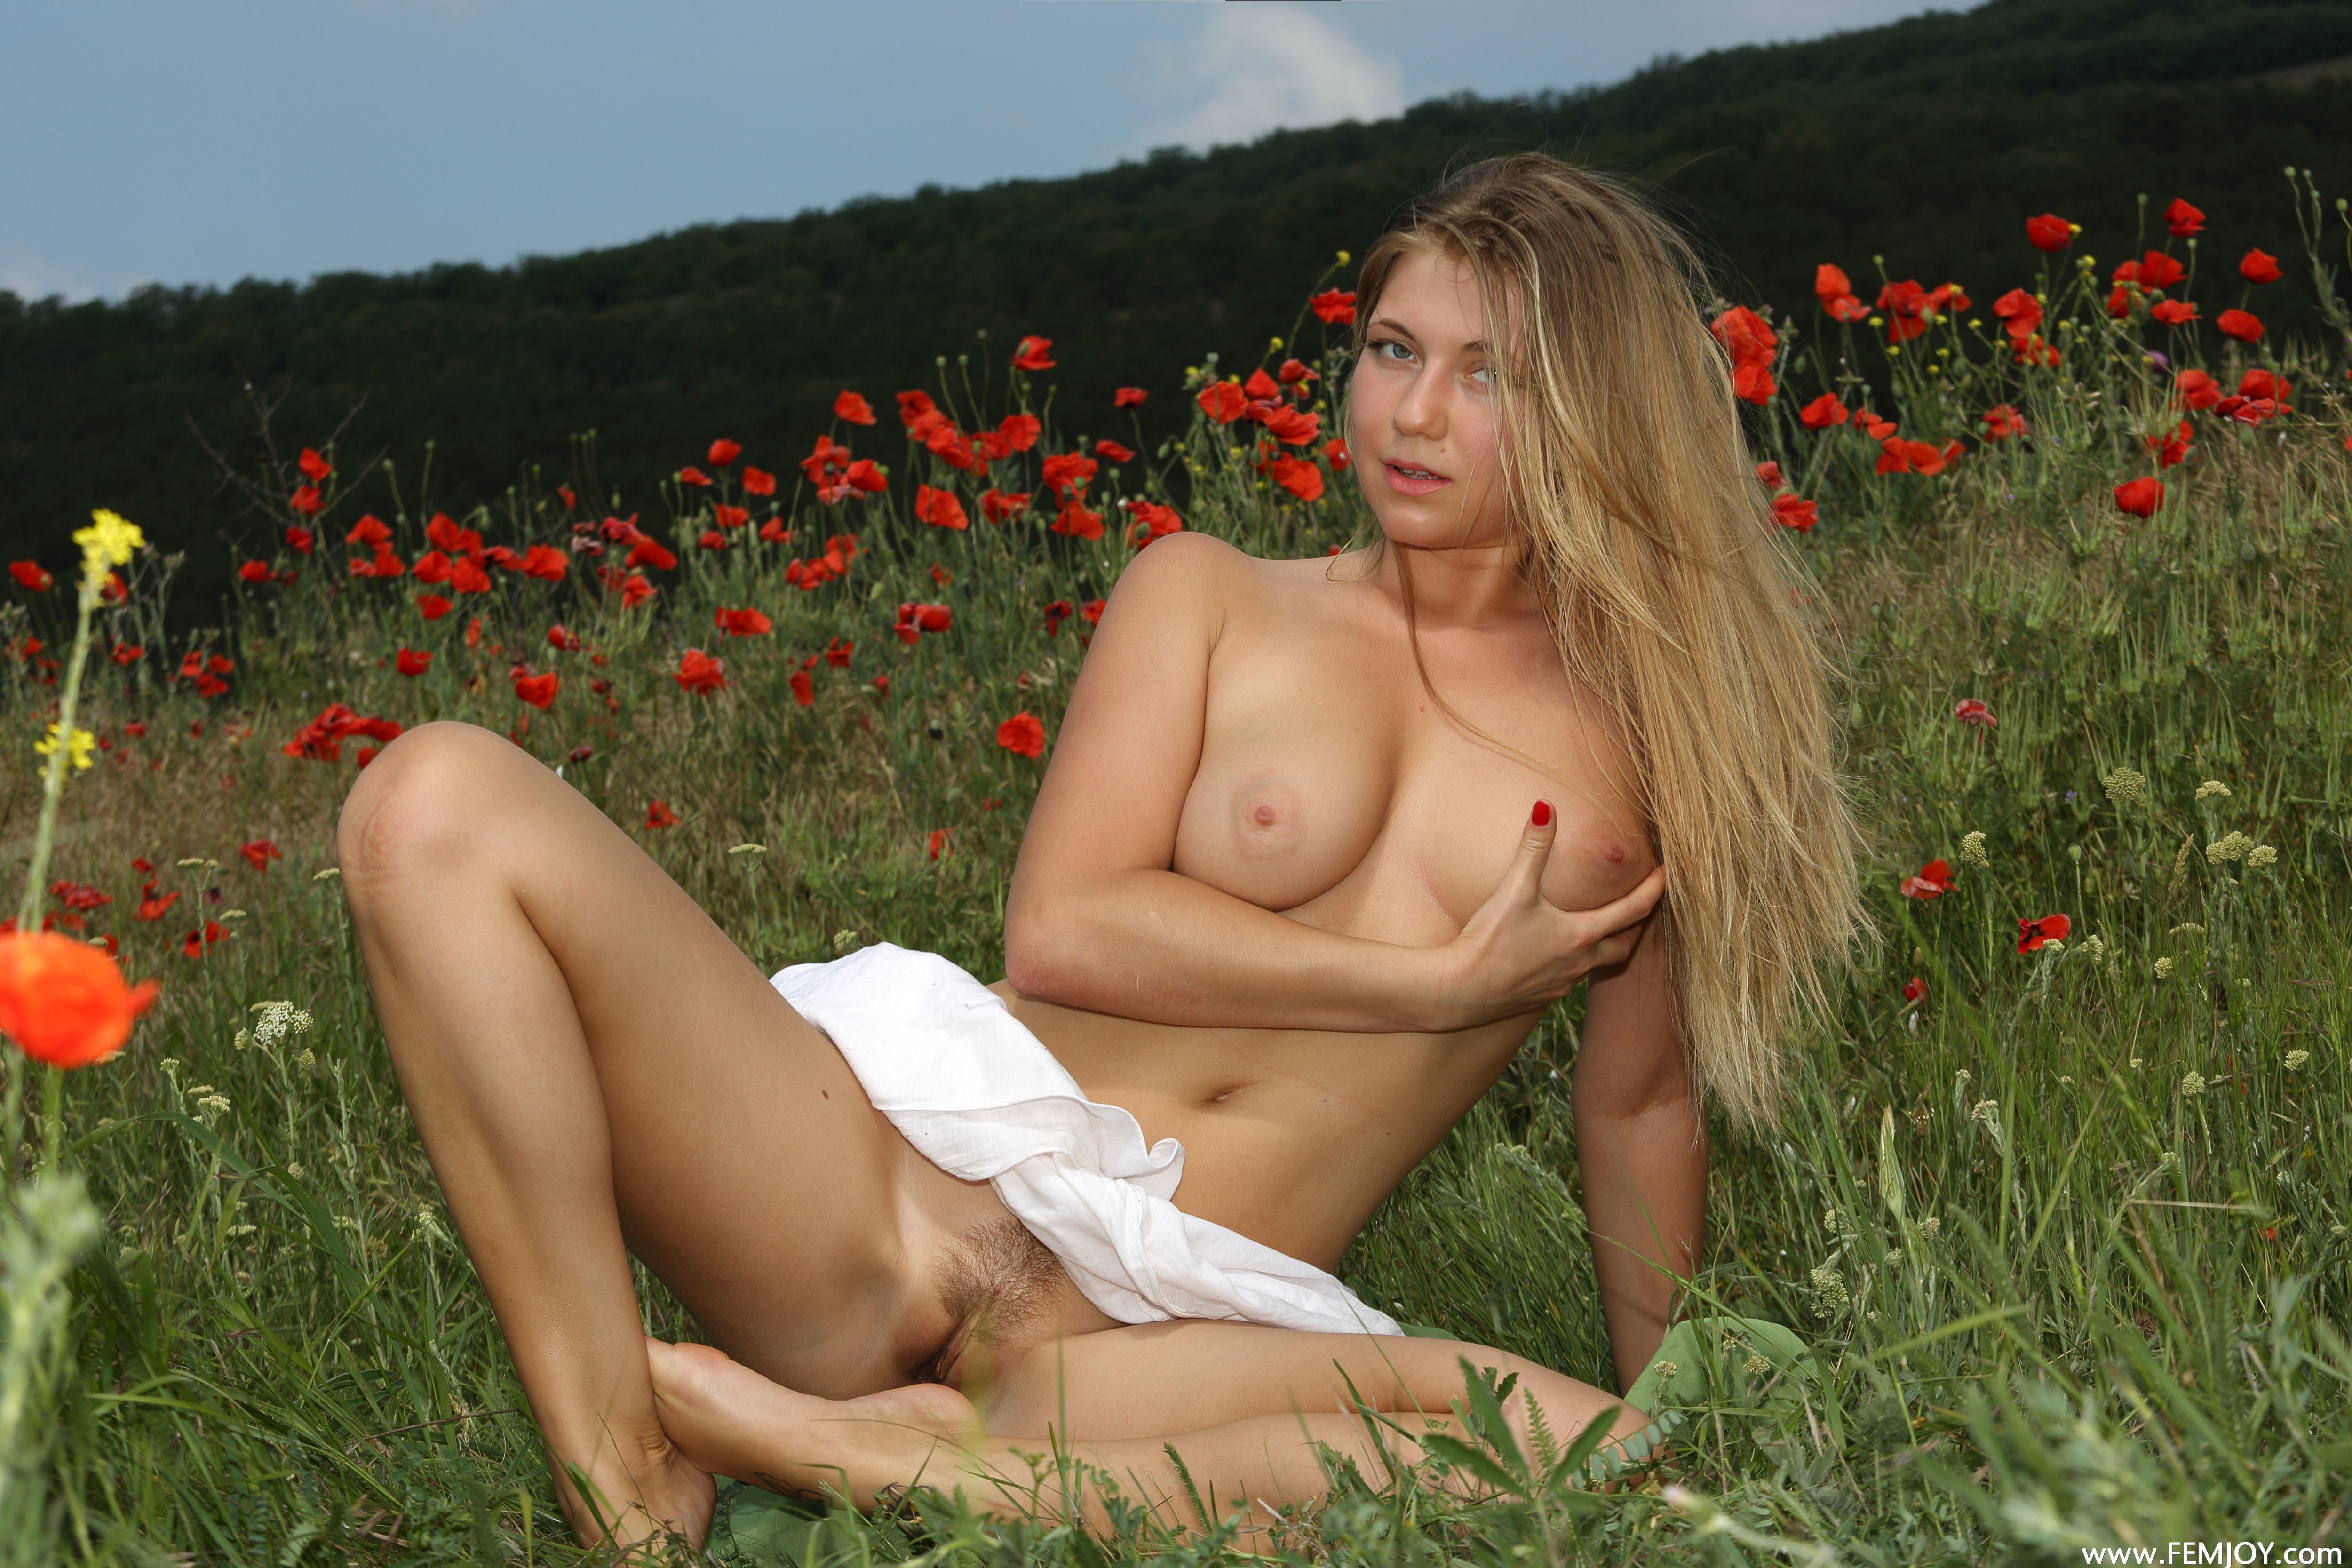 http://i5.imageban.ru/out/2013/10/27/c44a274e9bff72ee1e2bc613e93b47f0.jpg